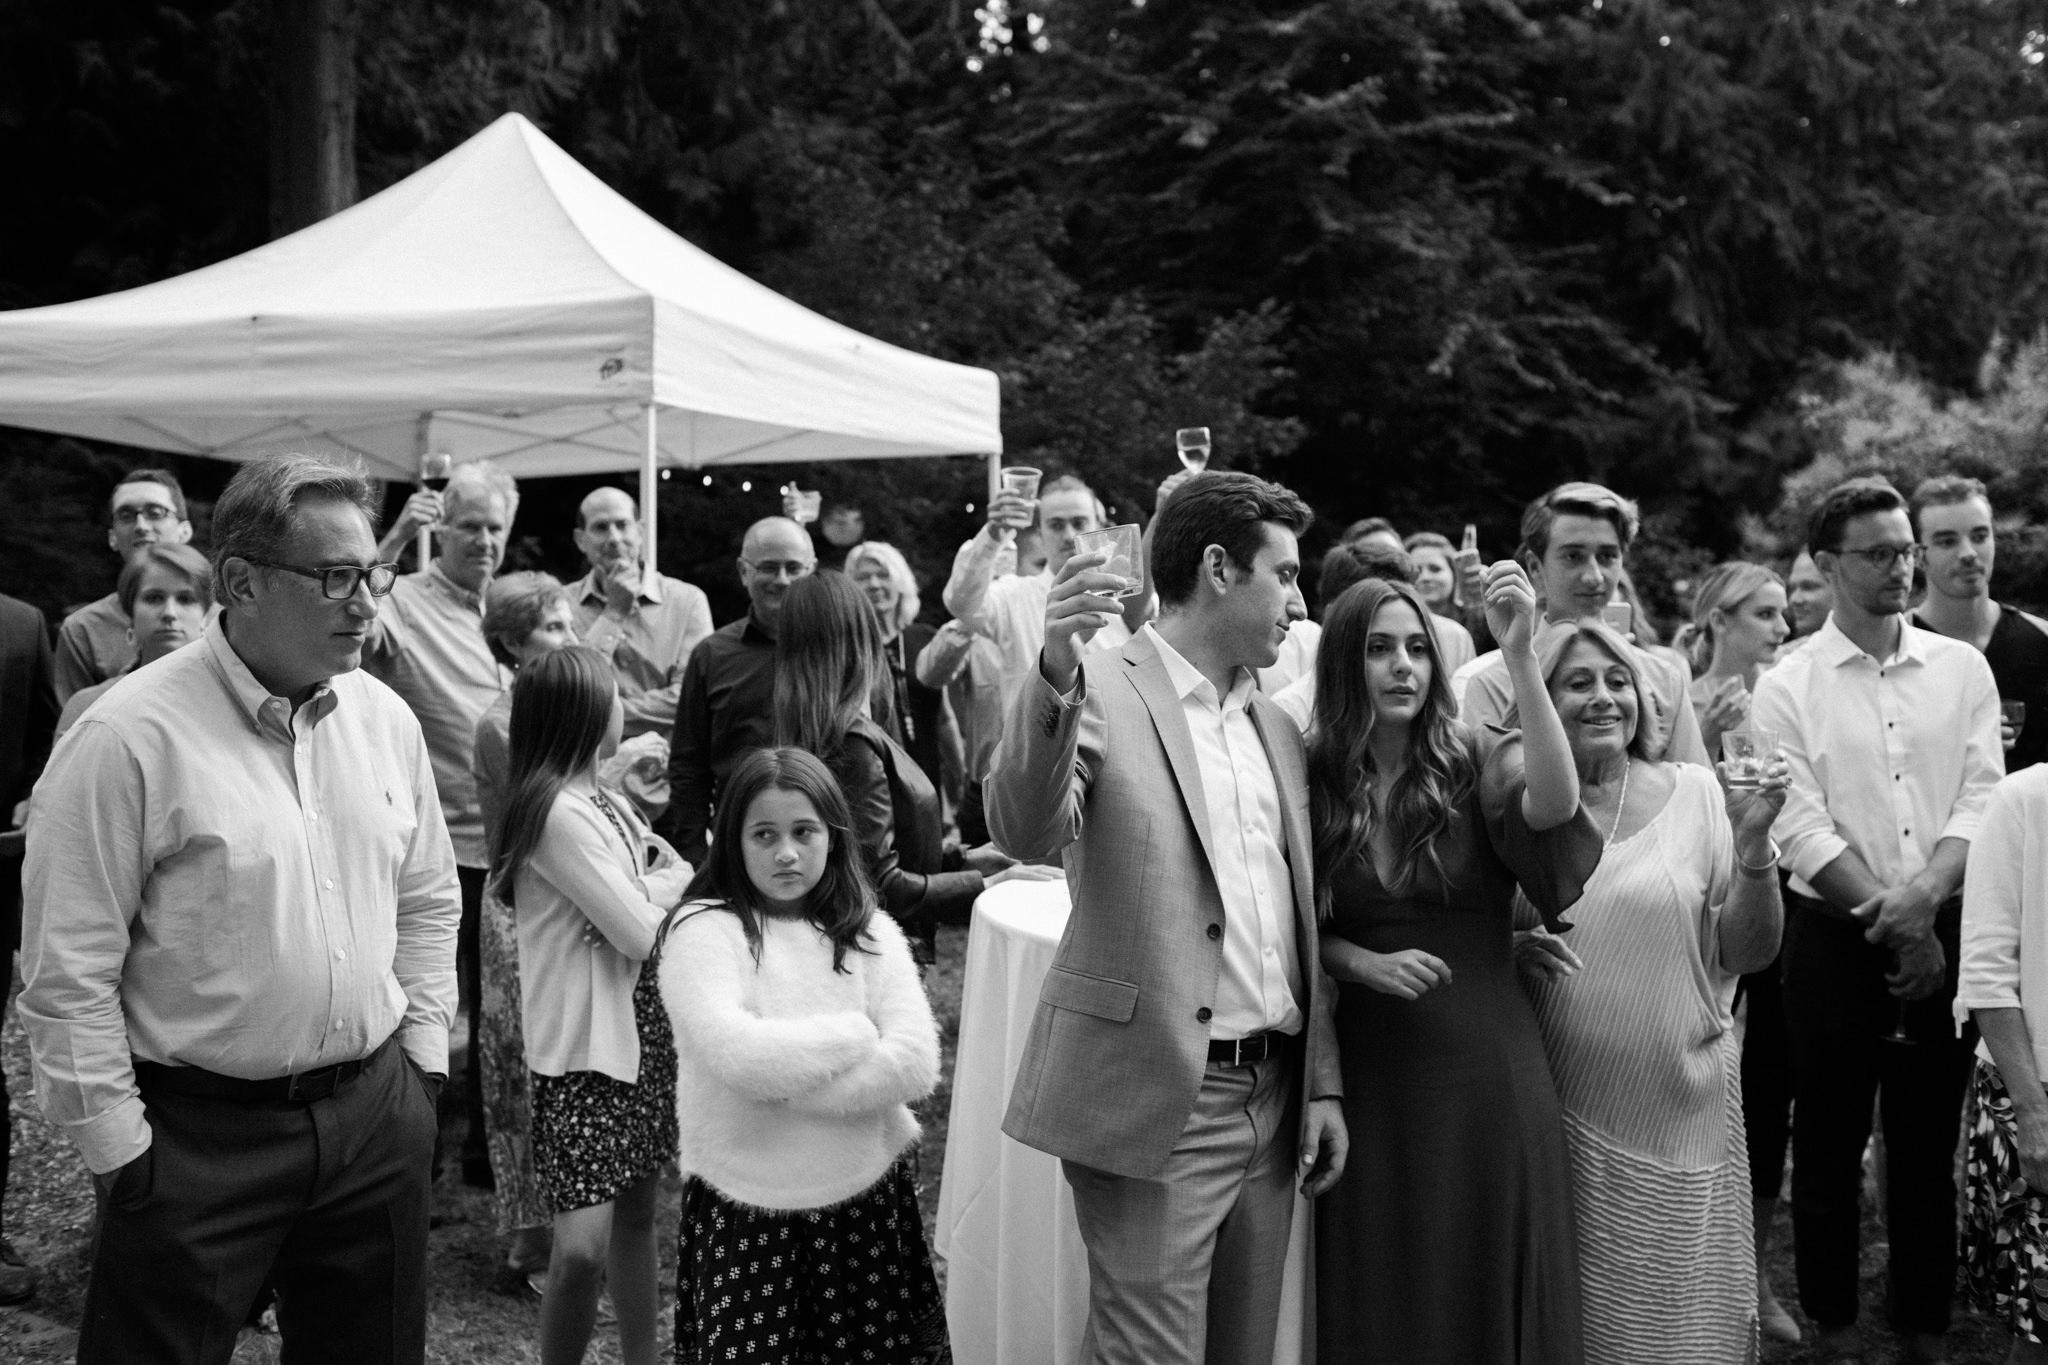 Backyard-Bainbridge-Island-Wedding-Alycia-Lovell-Photography-193.JPG